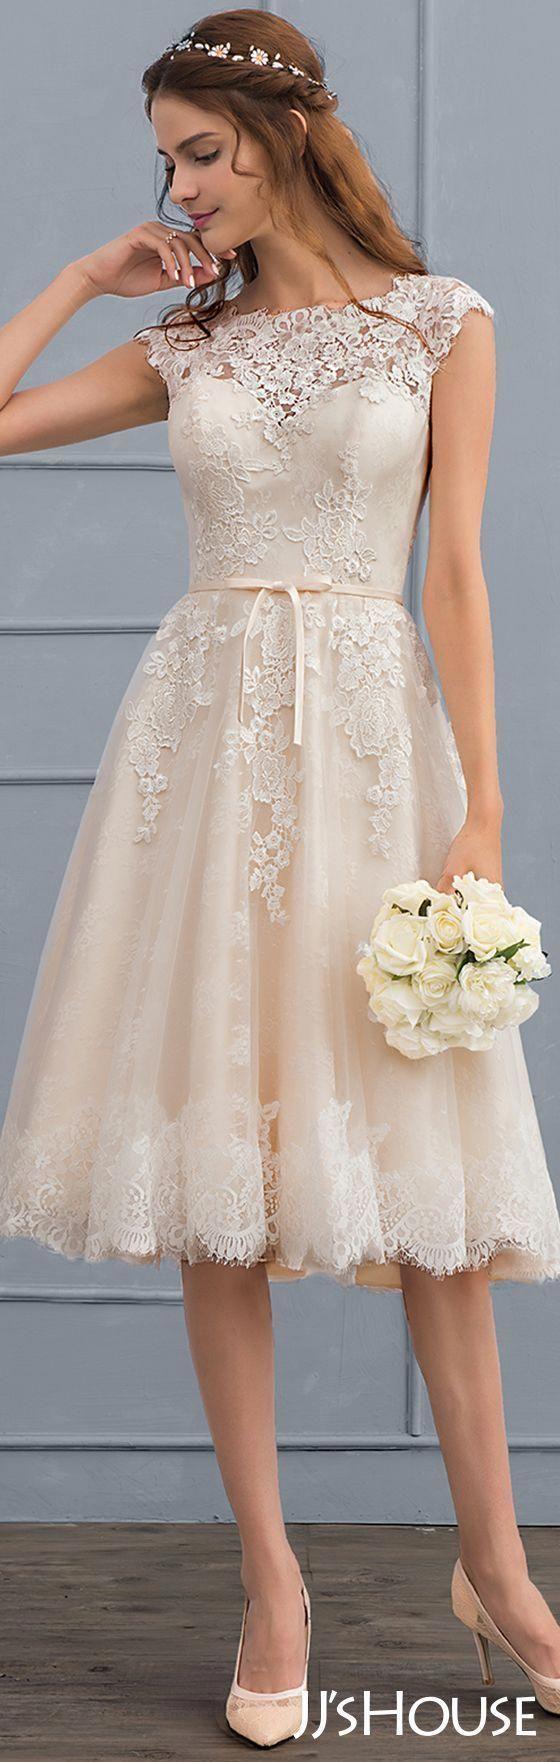 Jjshouse Wedding Simplelaceweddingdressesshort Short Lace Wedding Dress Wedding Dress Patterns Diy Wedding Dress [ 1762 x 560 Pixel ]